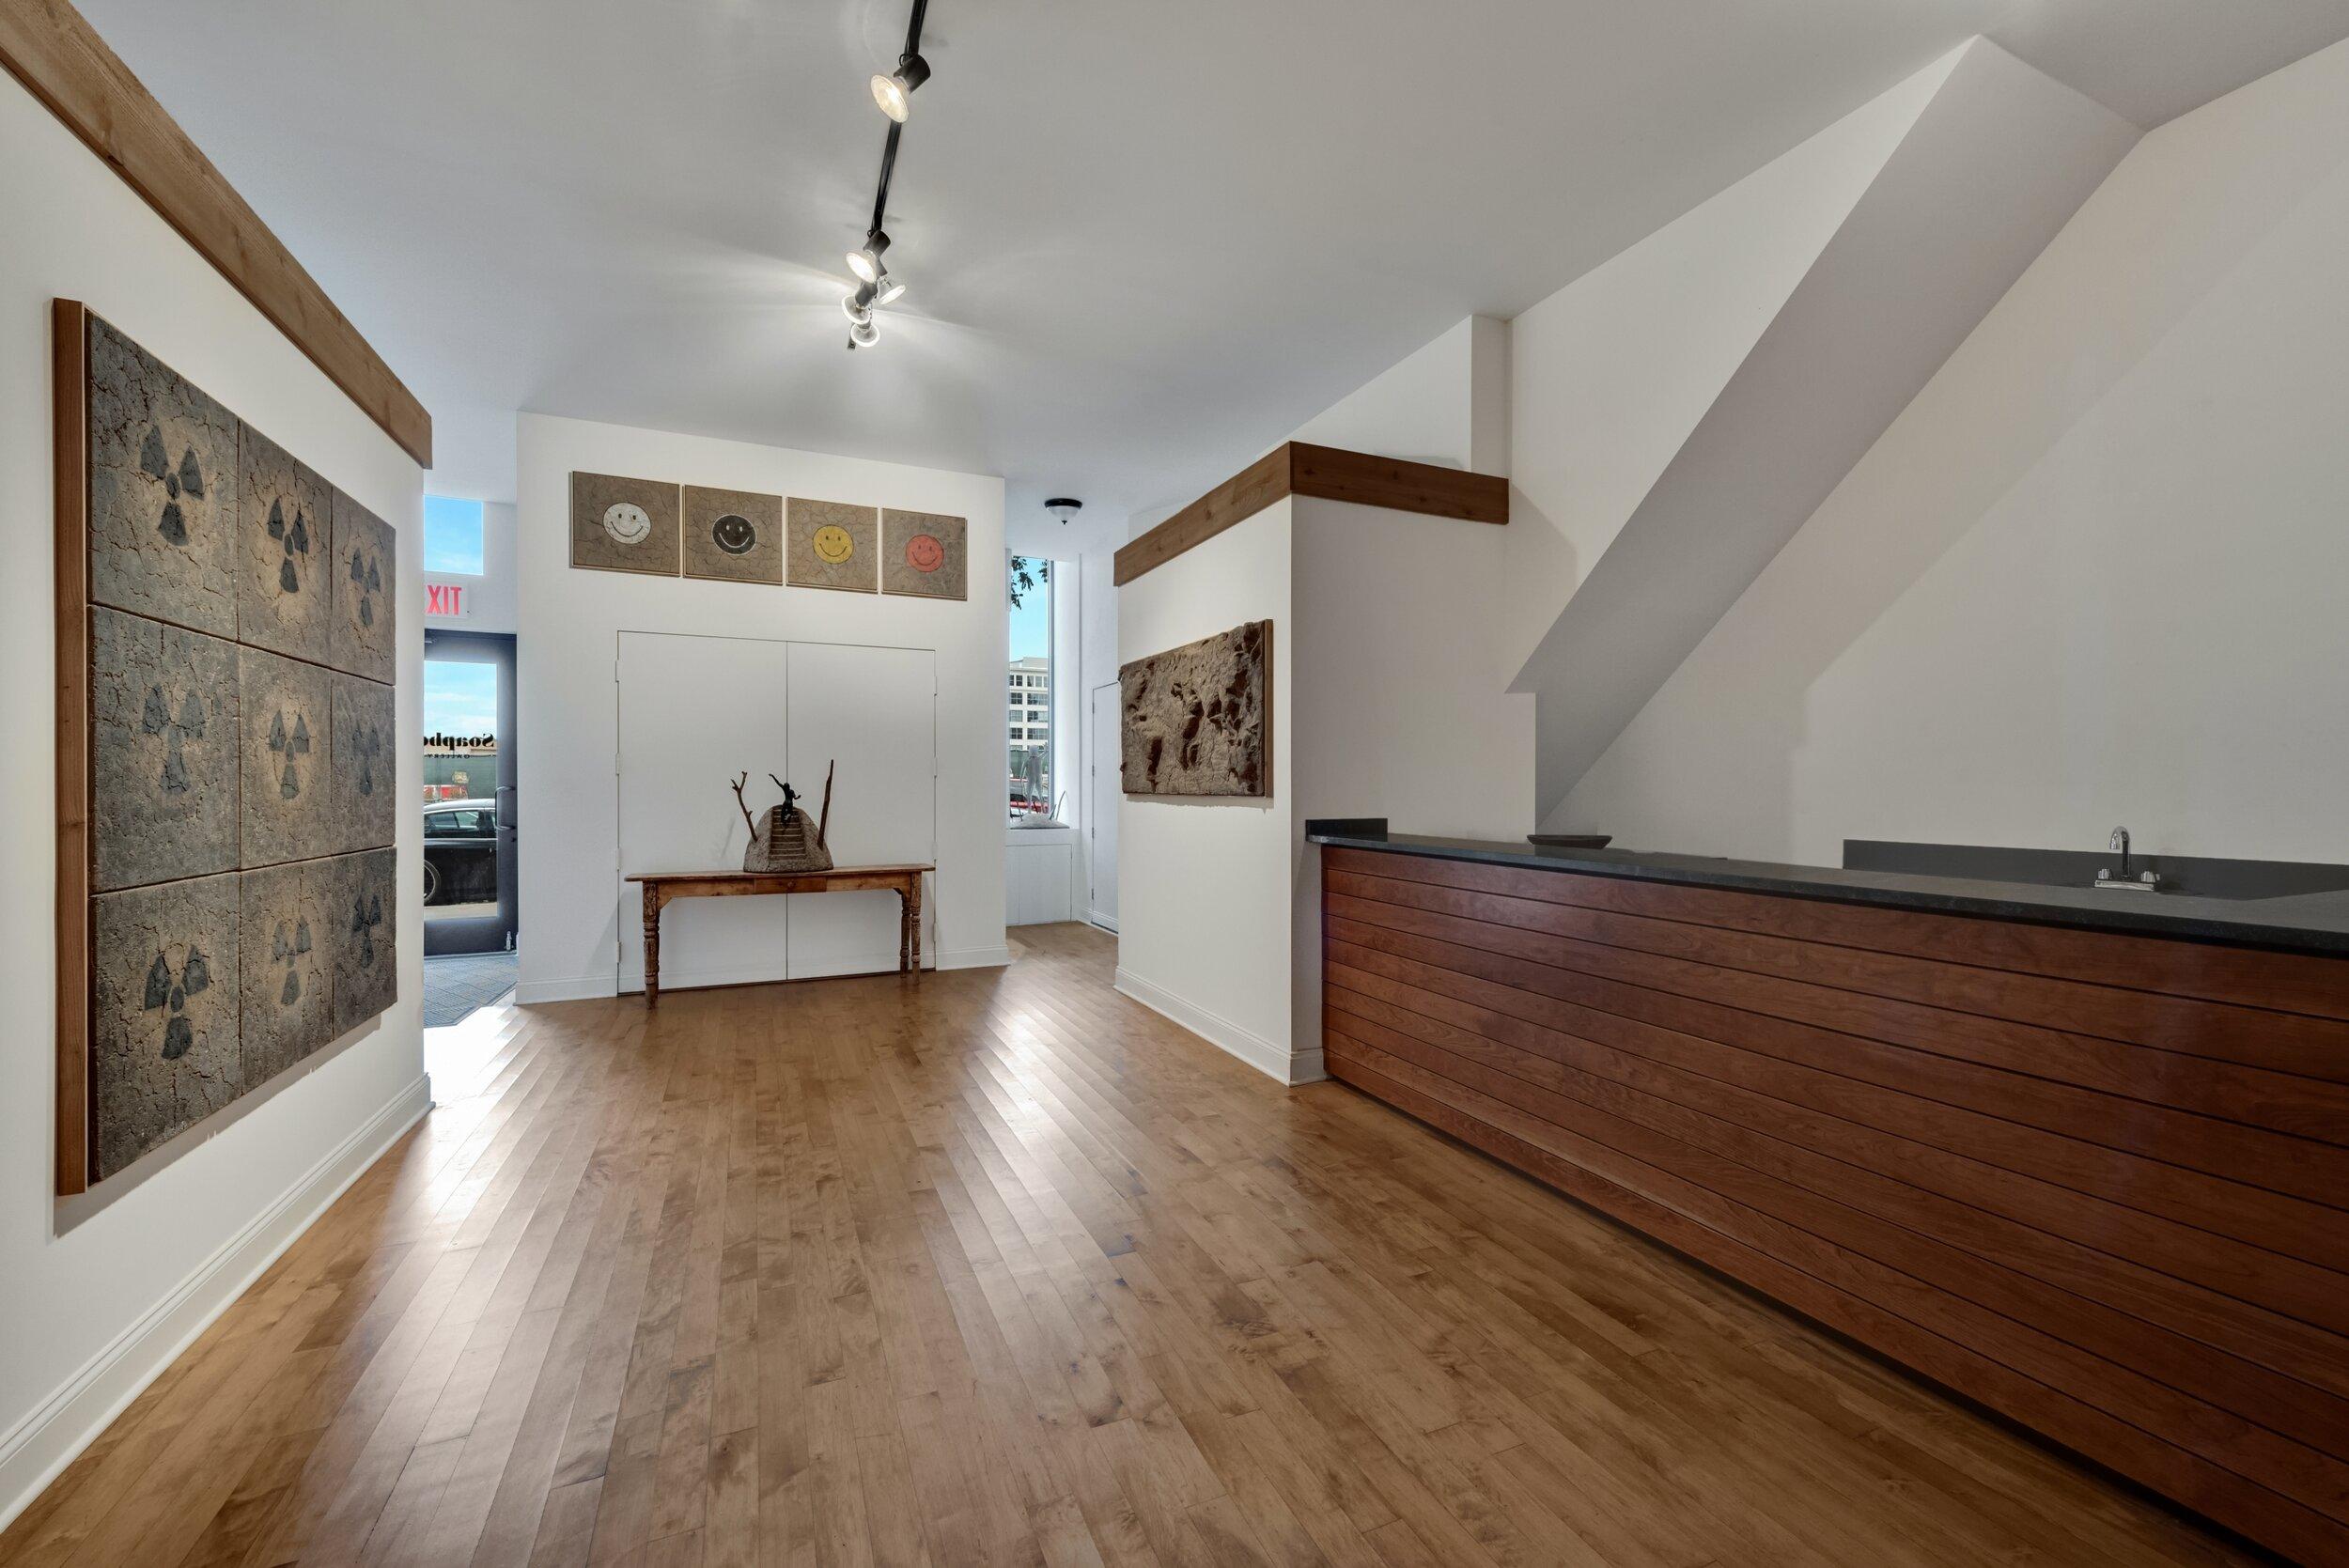 636-dean-street-gallery-015.jpg